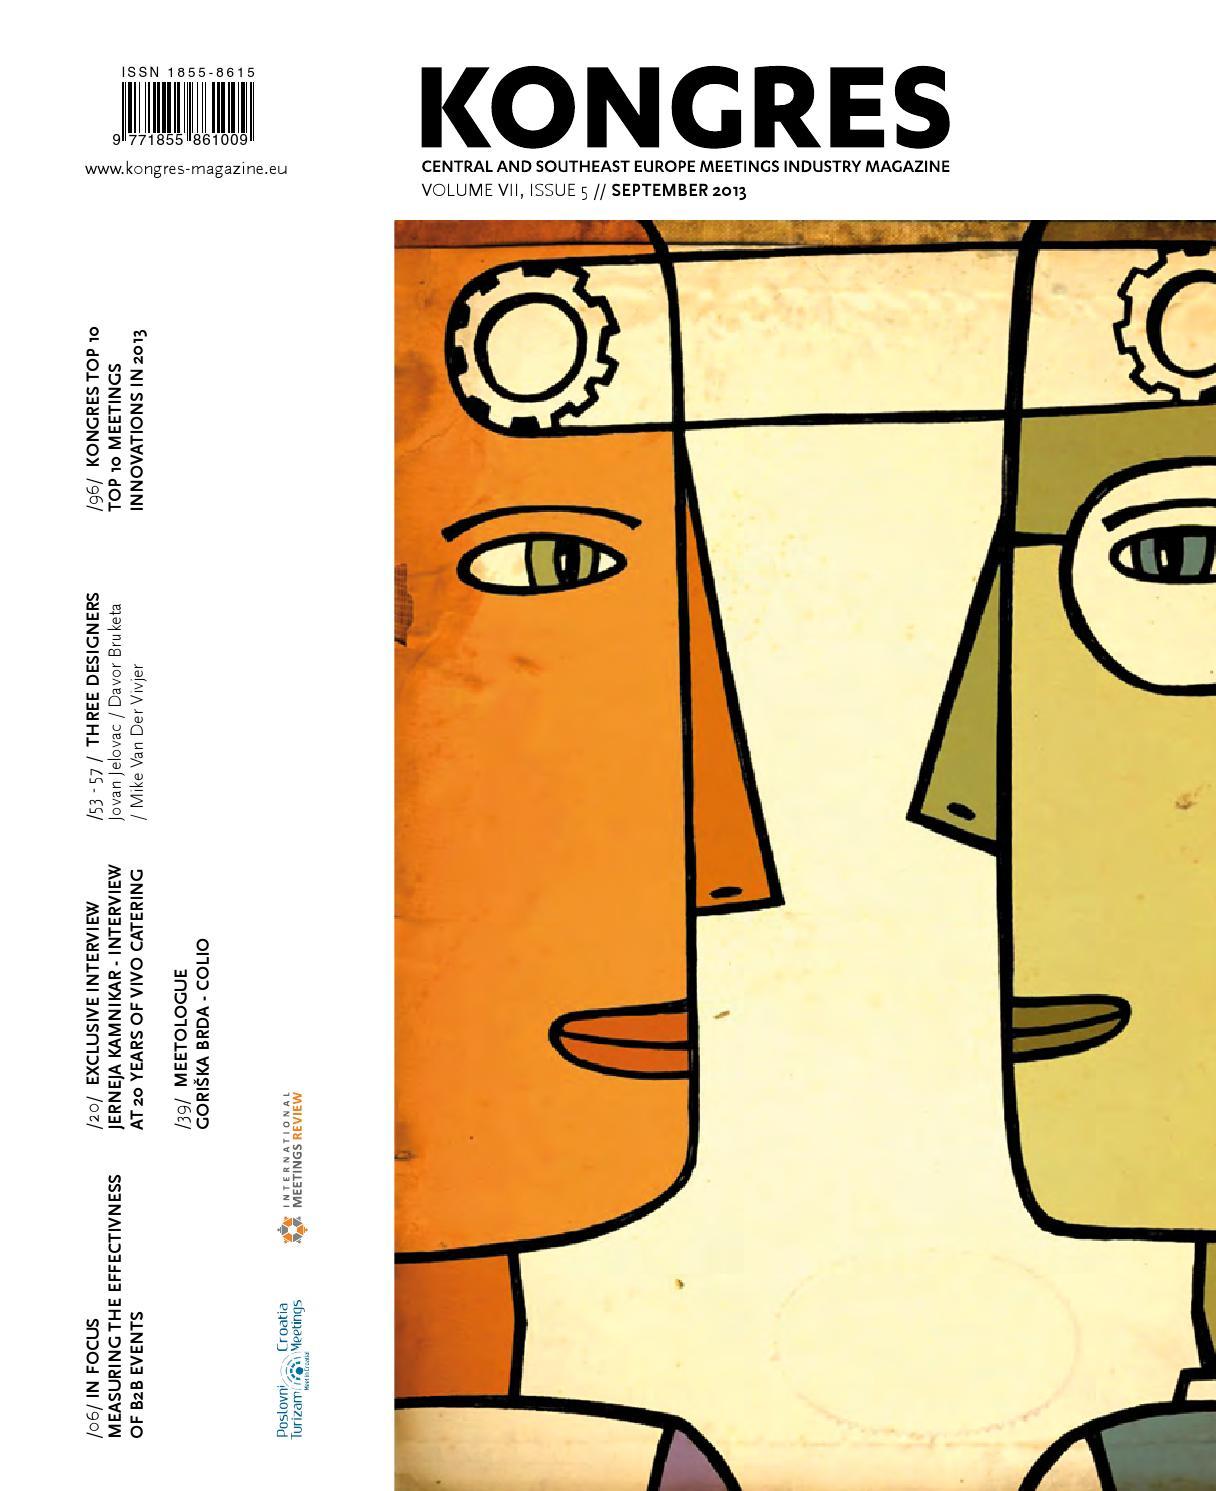 KONGRES MAGAZINE AUTUMN ISSUE